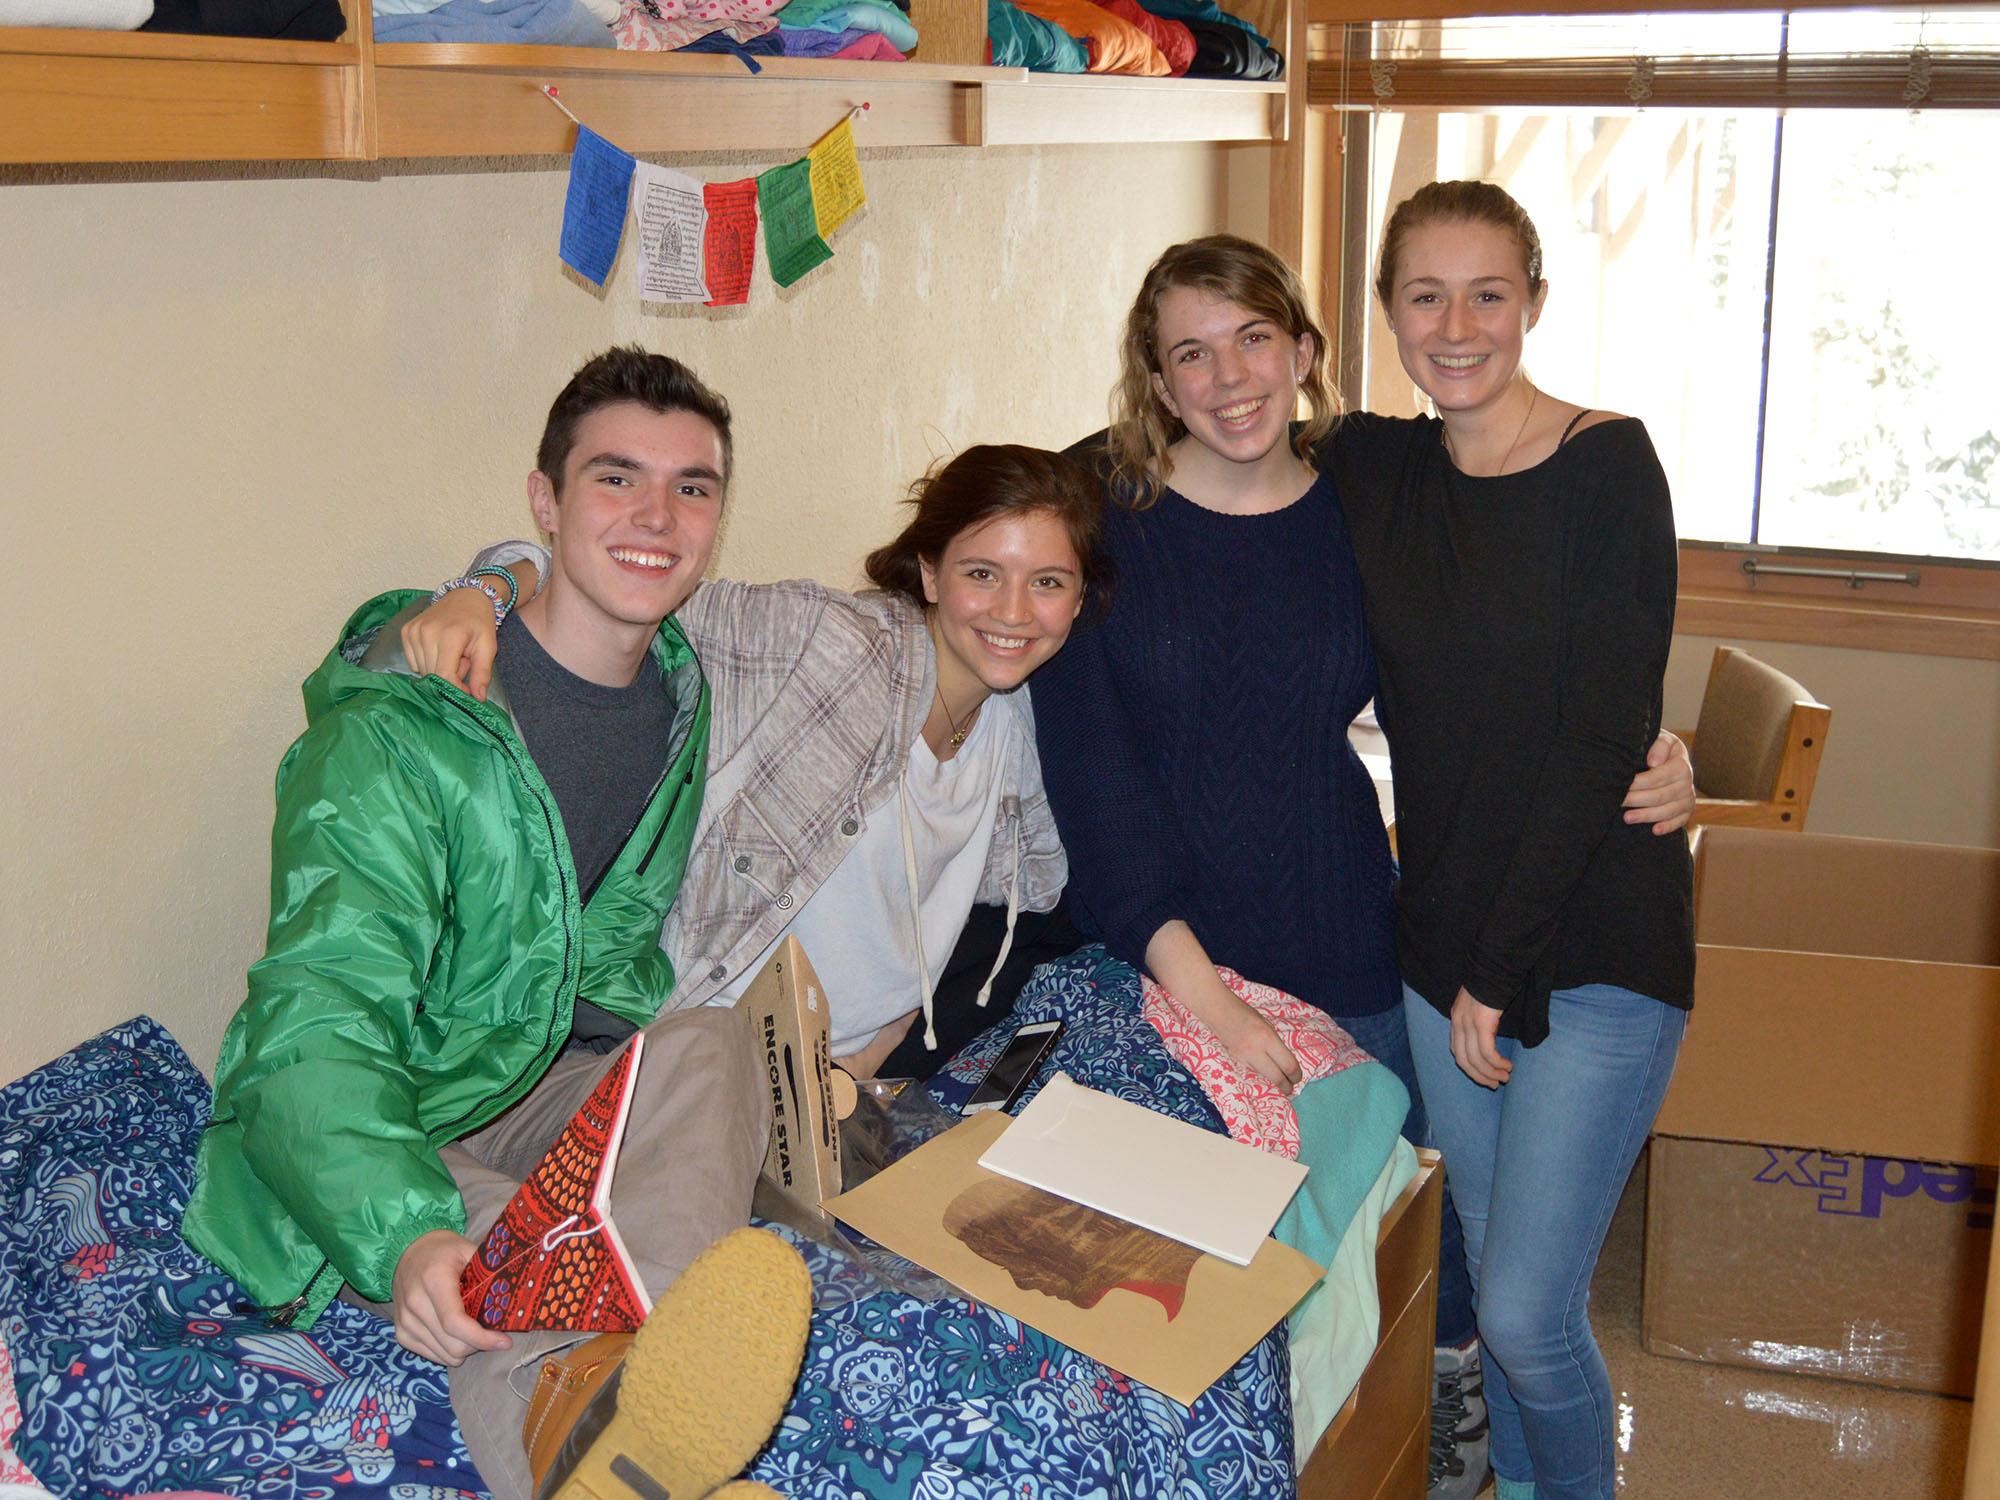 15-01-30 candid girl friends dorm room | conserve school blog